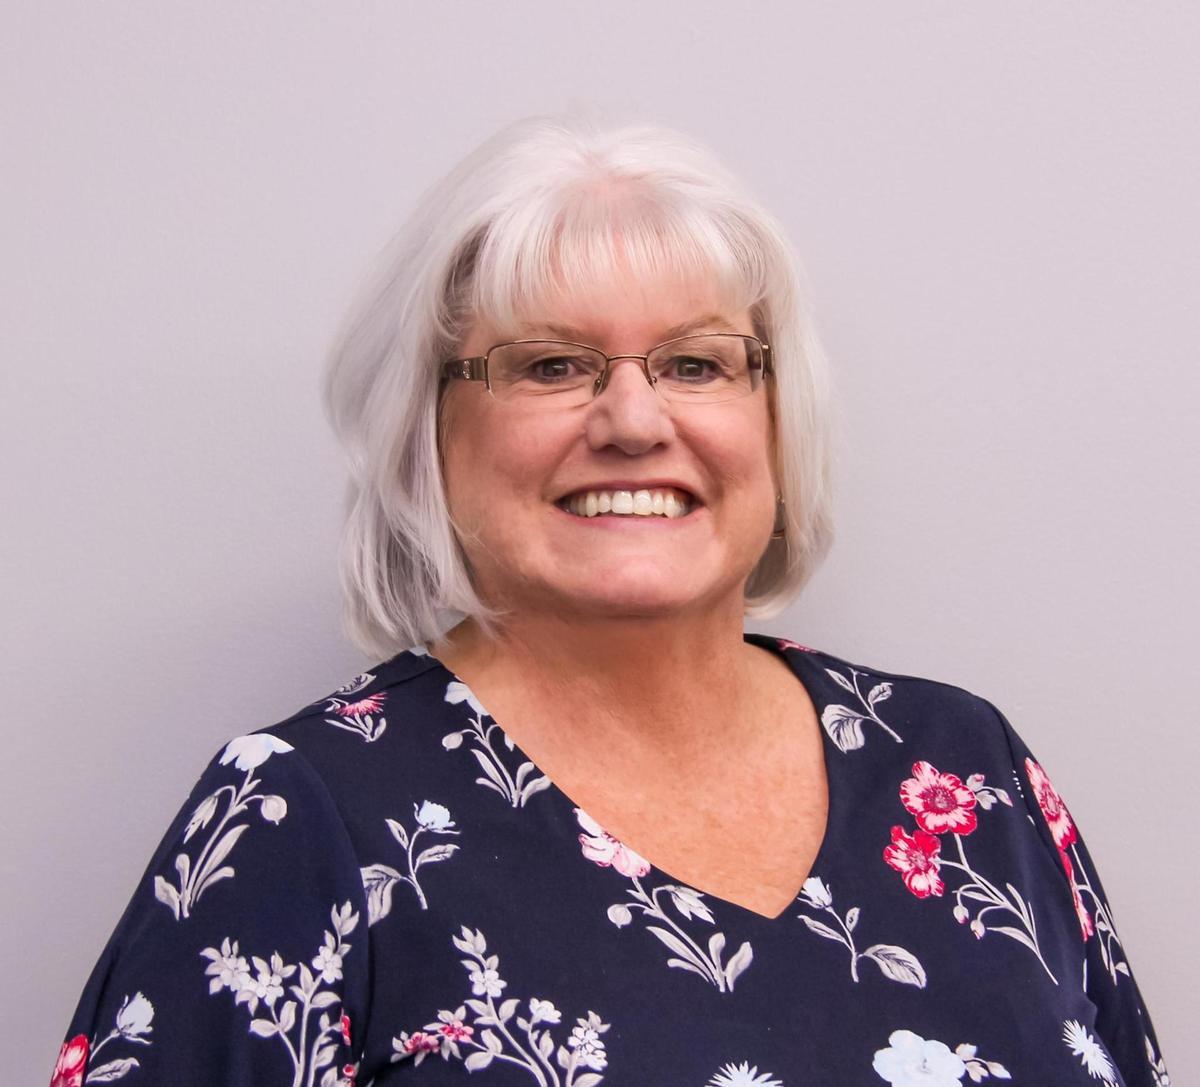 Brenda Ritchie, Administrative Assistant